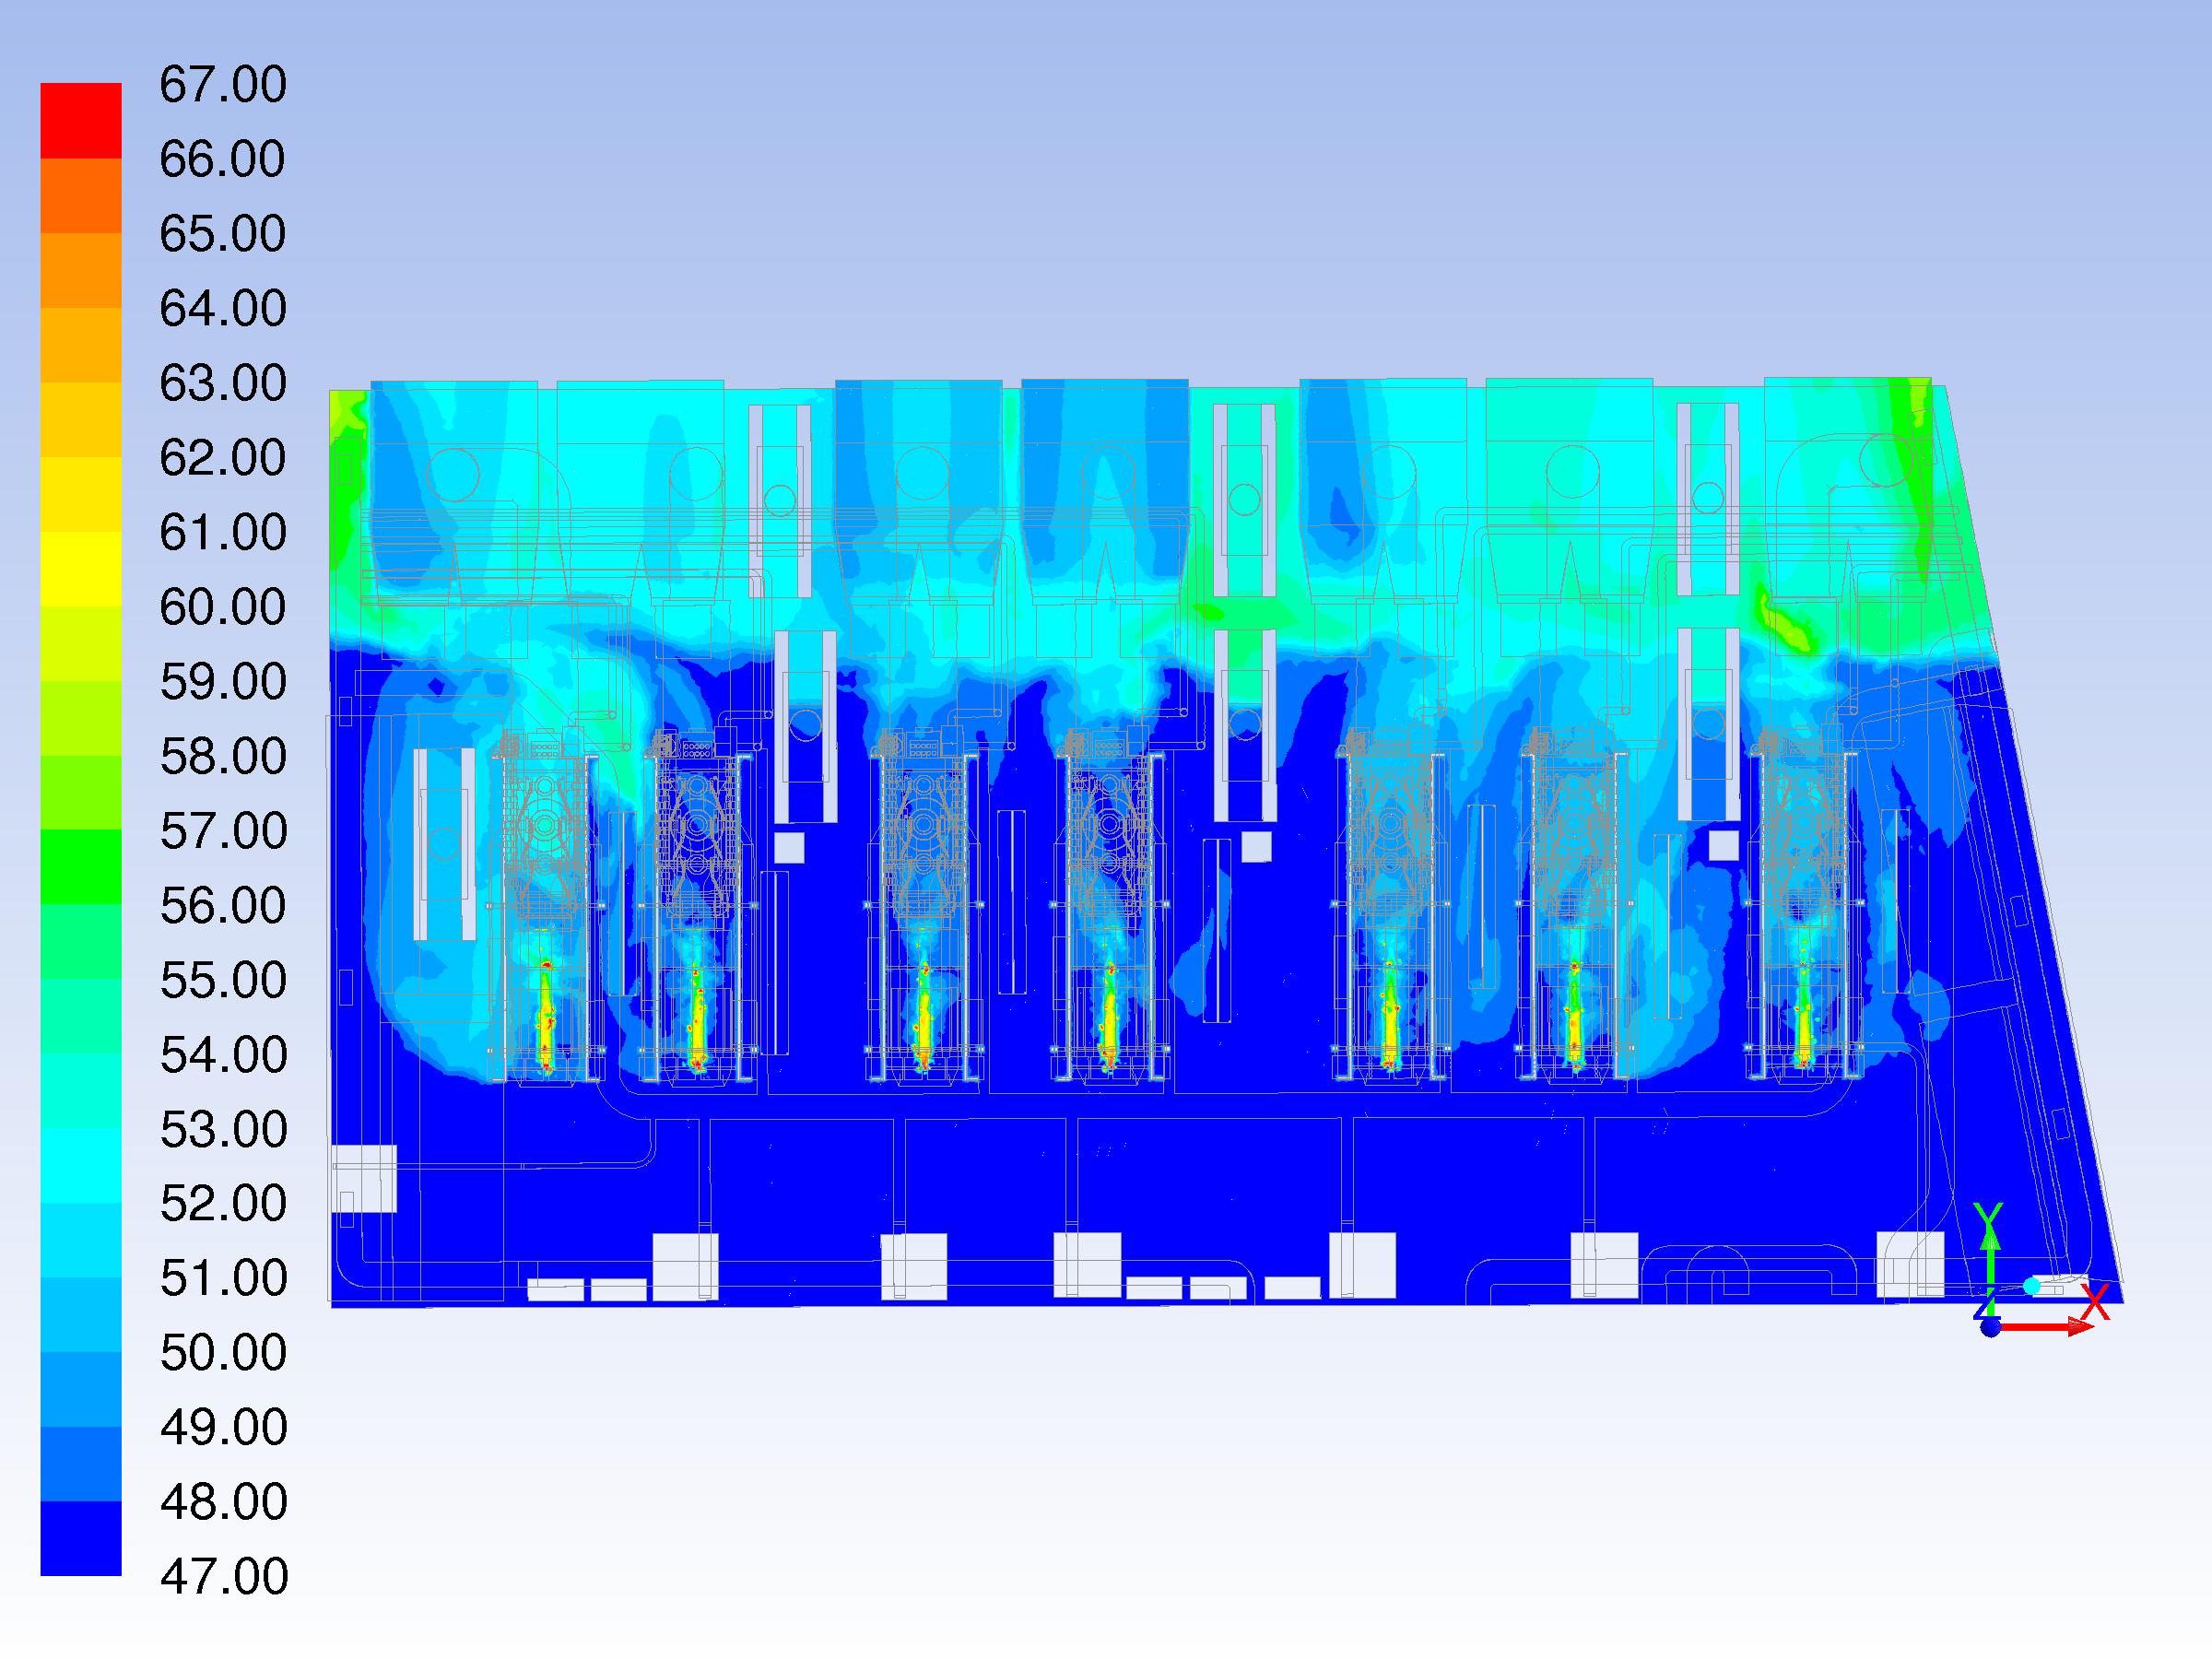 genset_19_mesh-1-19200__tempzz00..55.png